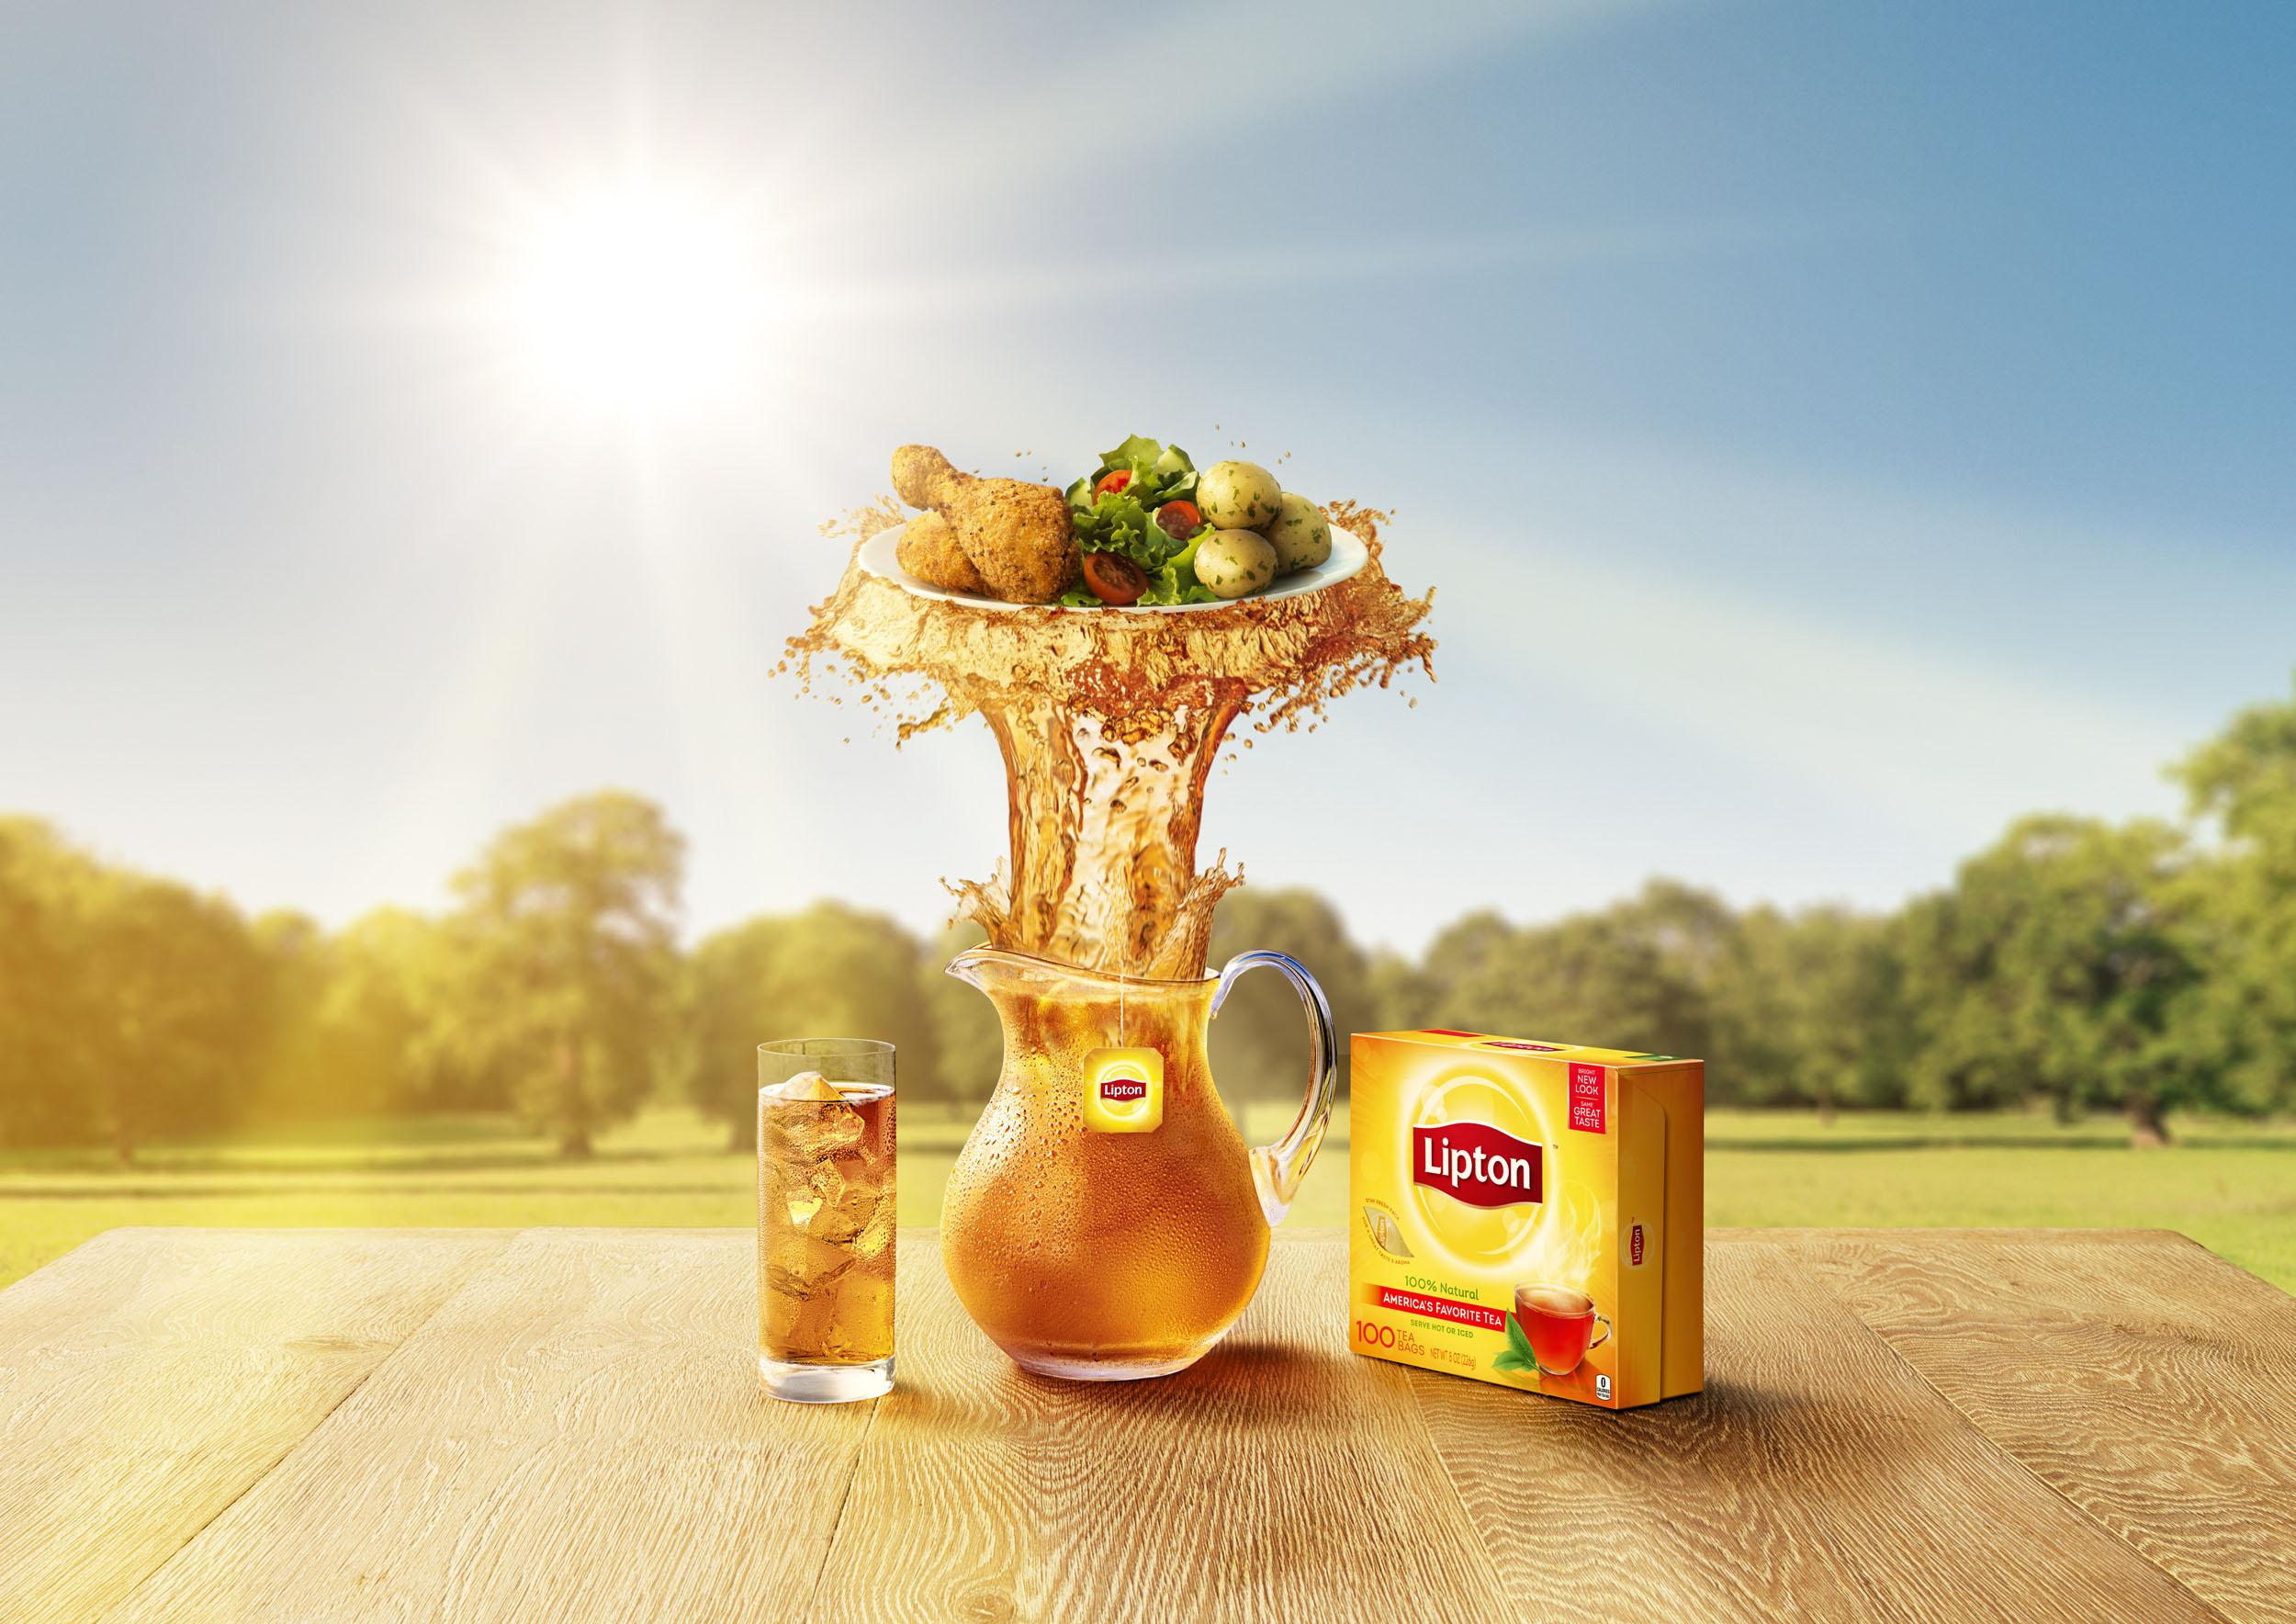 BOOM_CGI_FOODANDDRINKS_liptons-ice-tea-jug.jpg